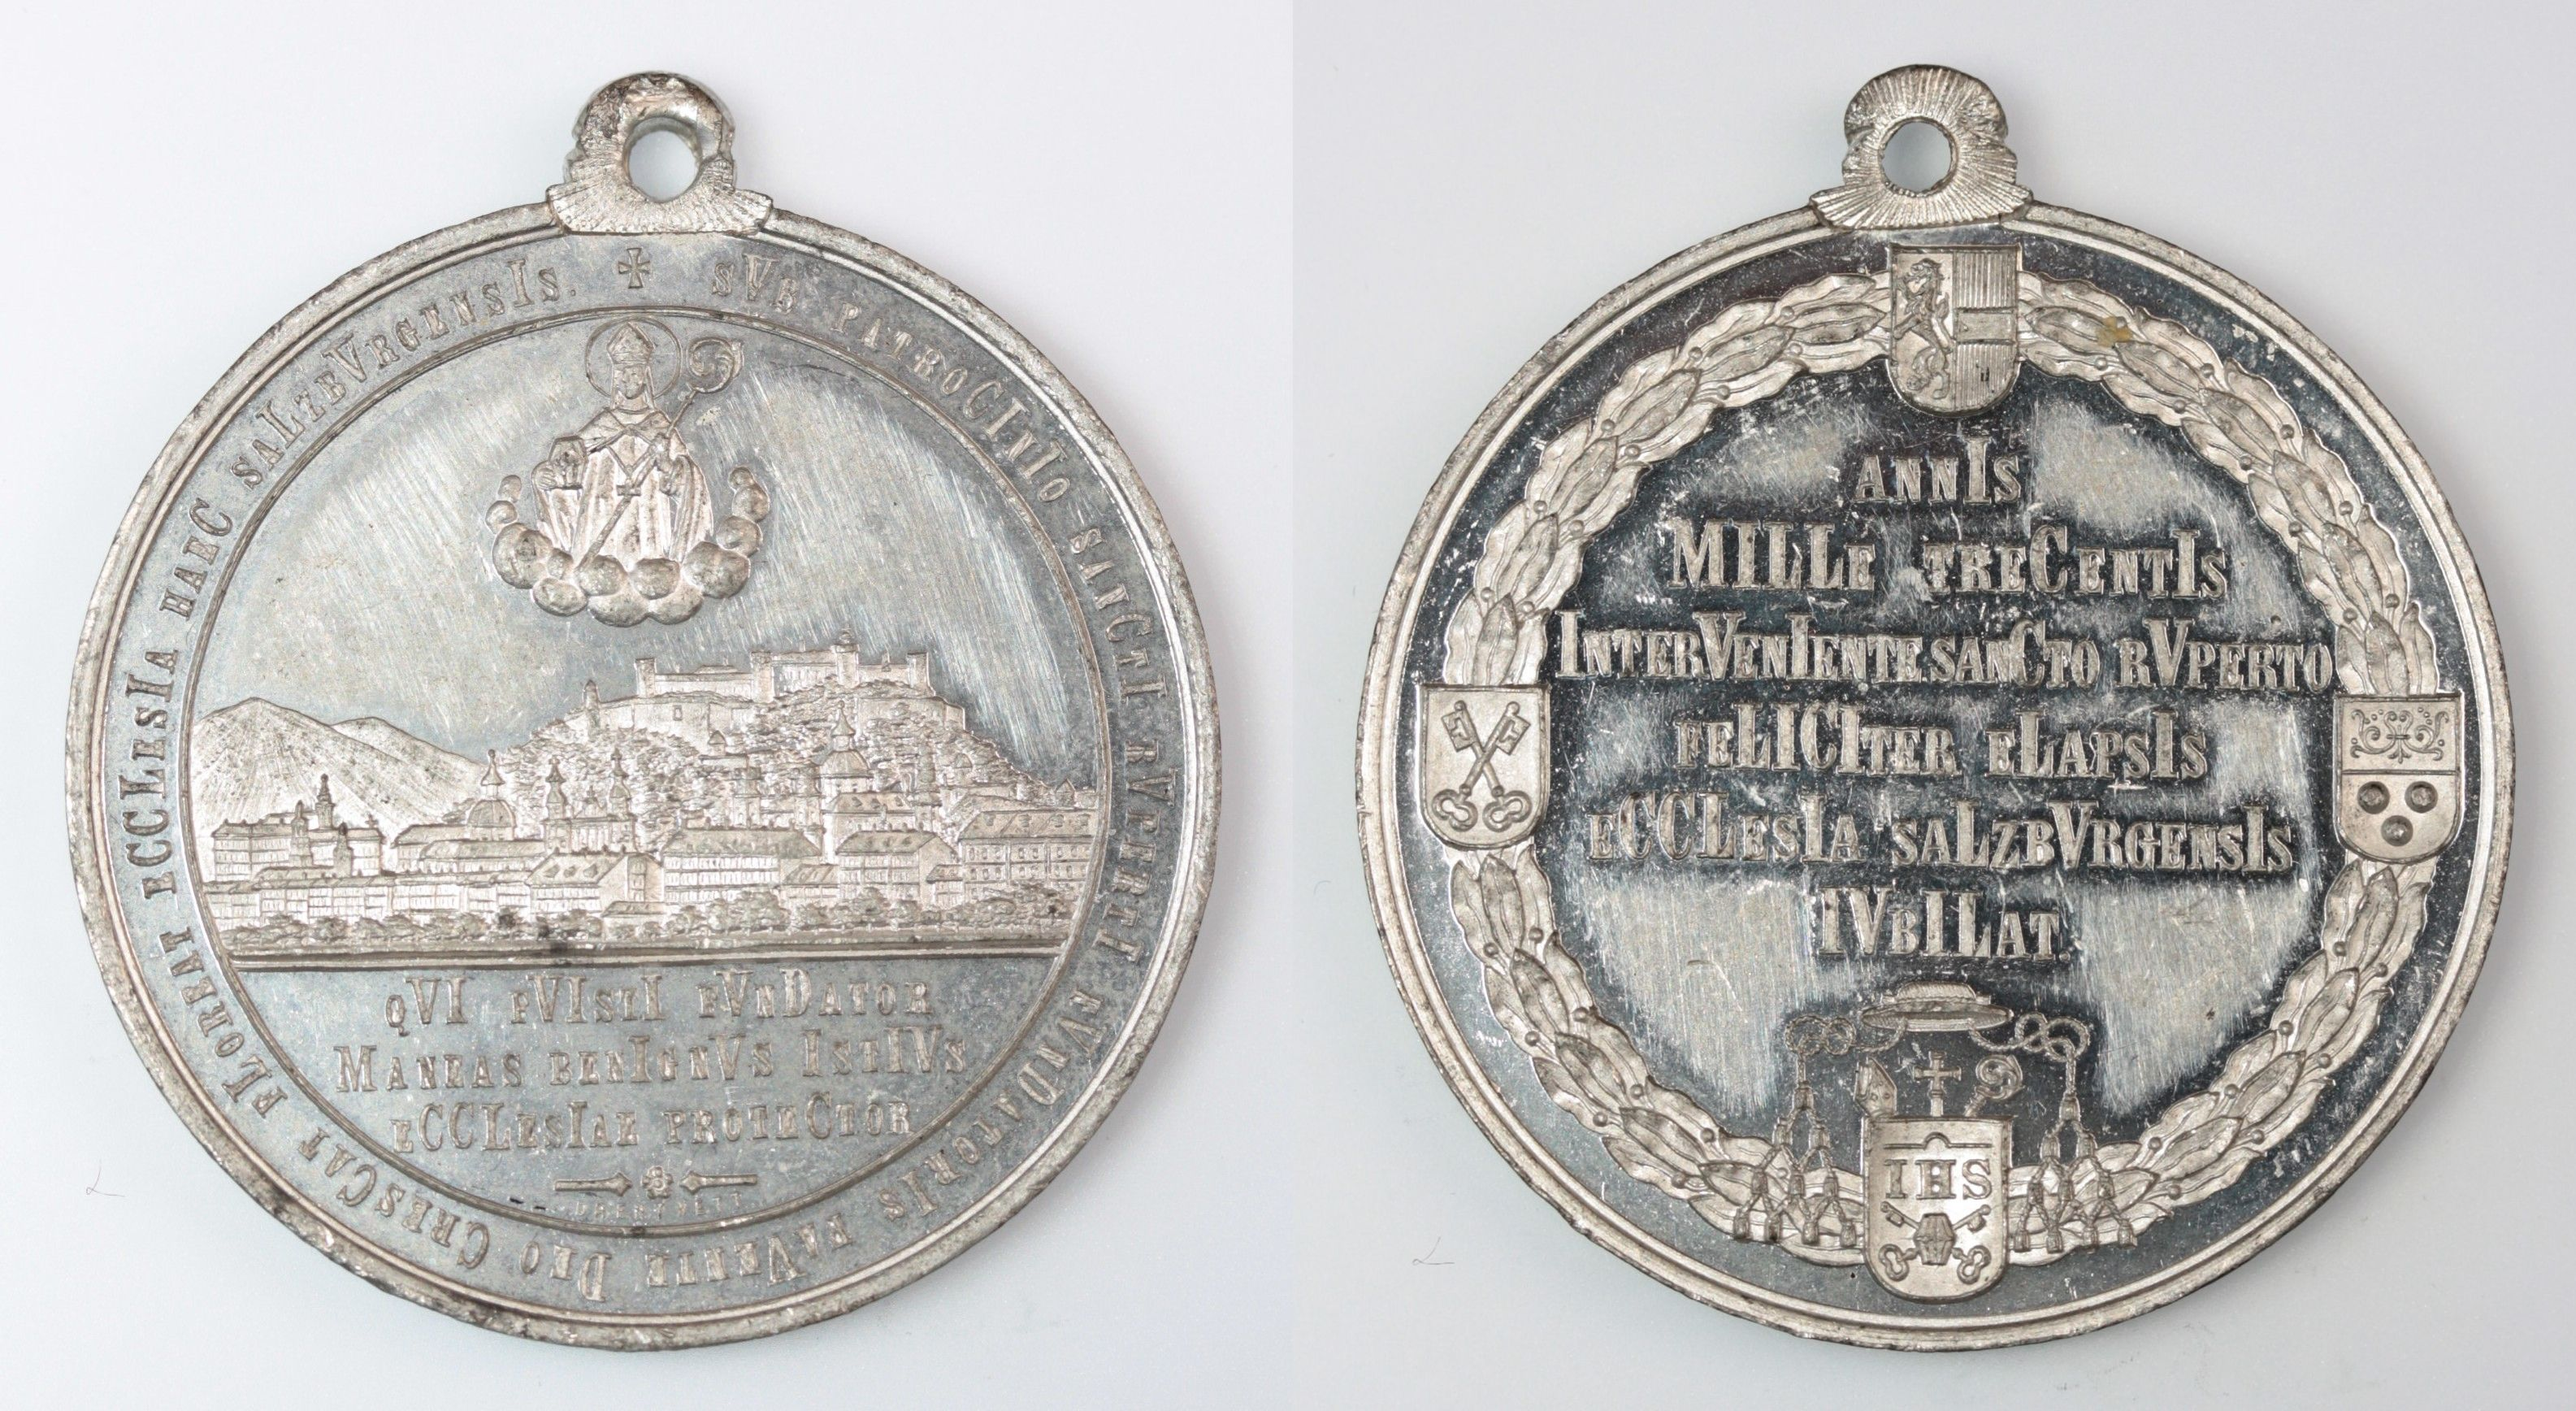 Stiftsjubiläum 1882